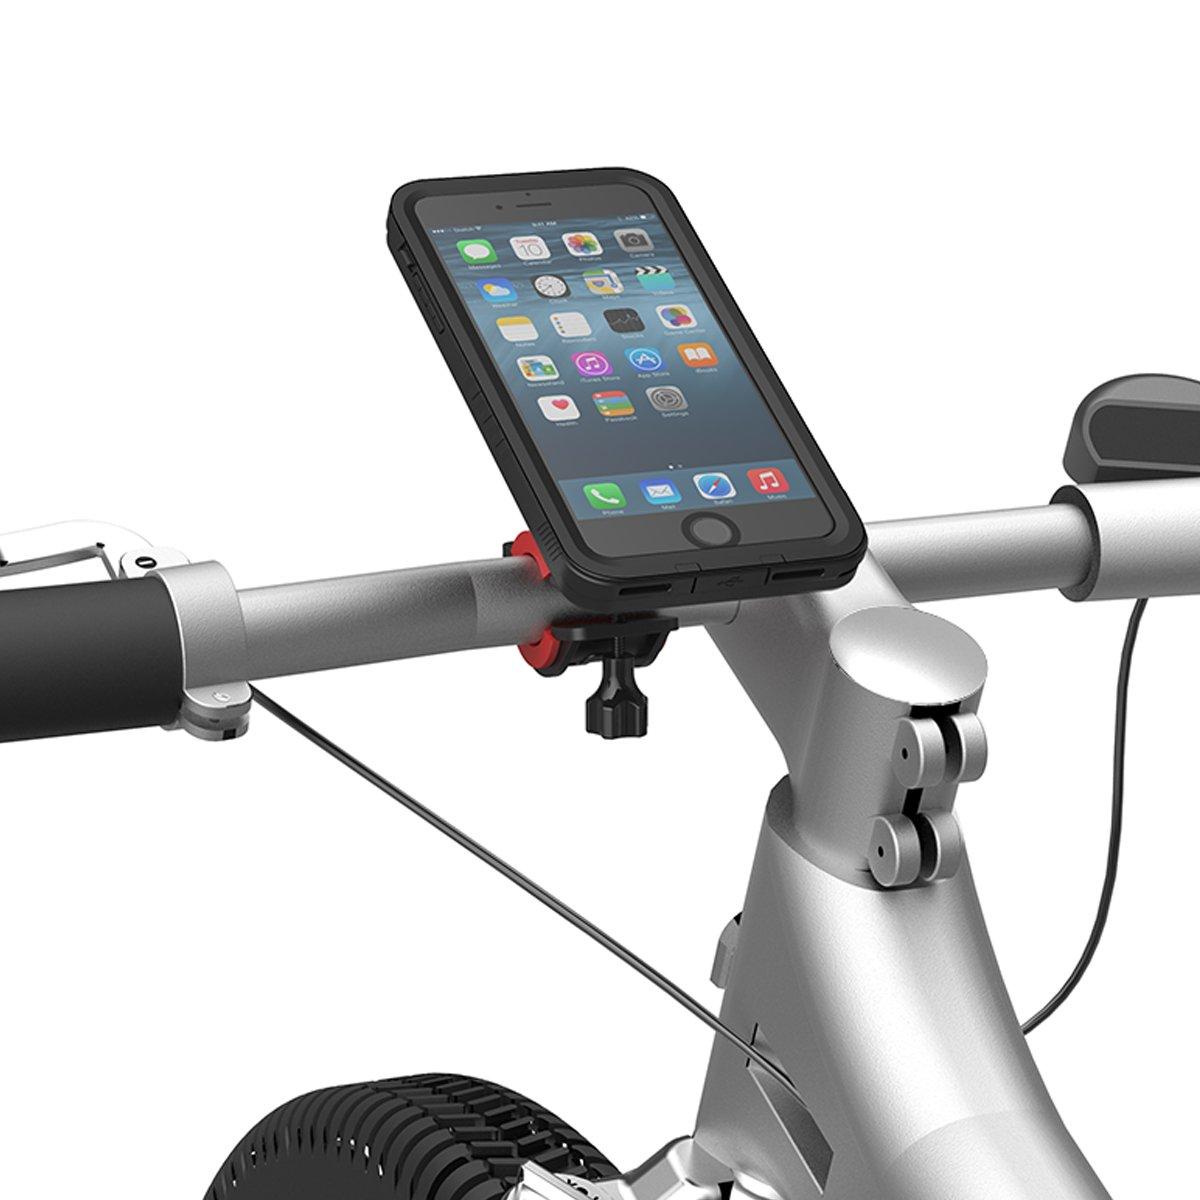 huge selection of f0b72 6e607 Bike Mount iPhone 7 Plus Waterproof Case, Yuqoka Shock-Resistant Bicycle  Holder Cradle for iPhone 7 Plus 5.5 Inch - Black